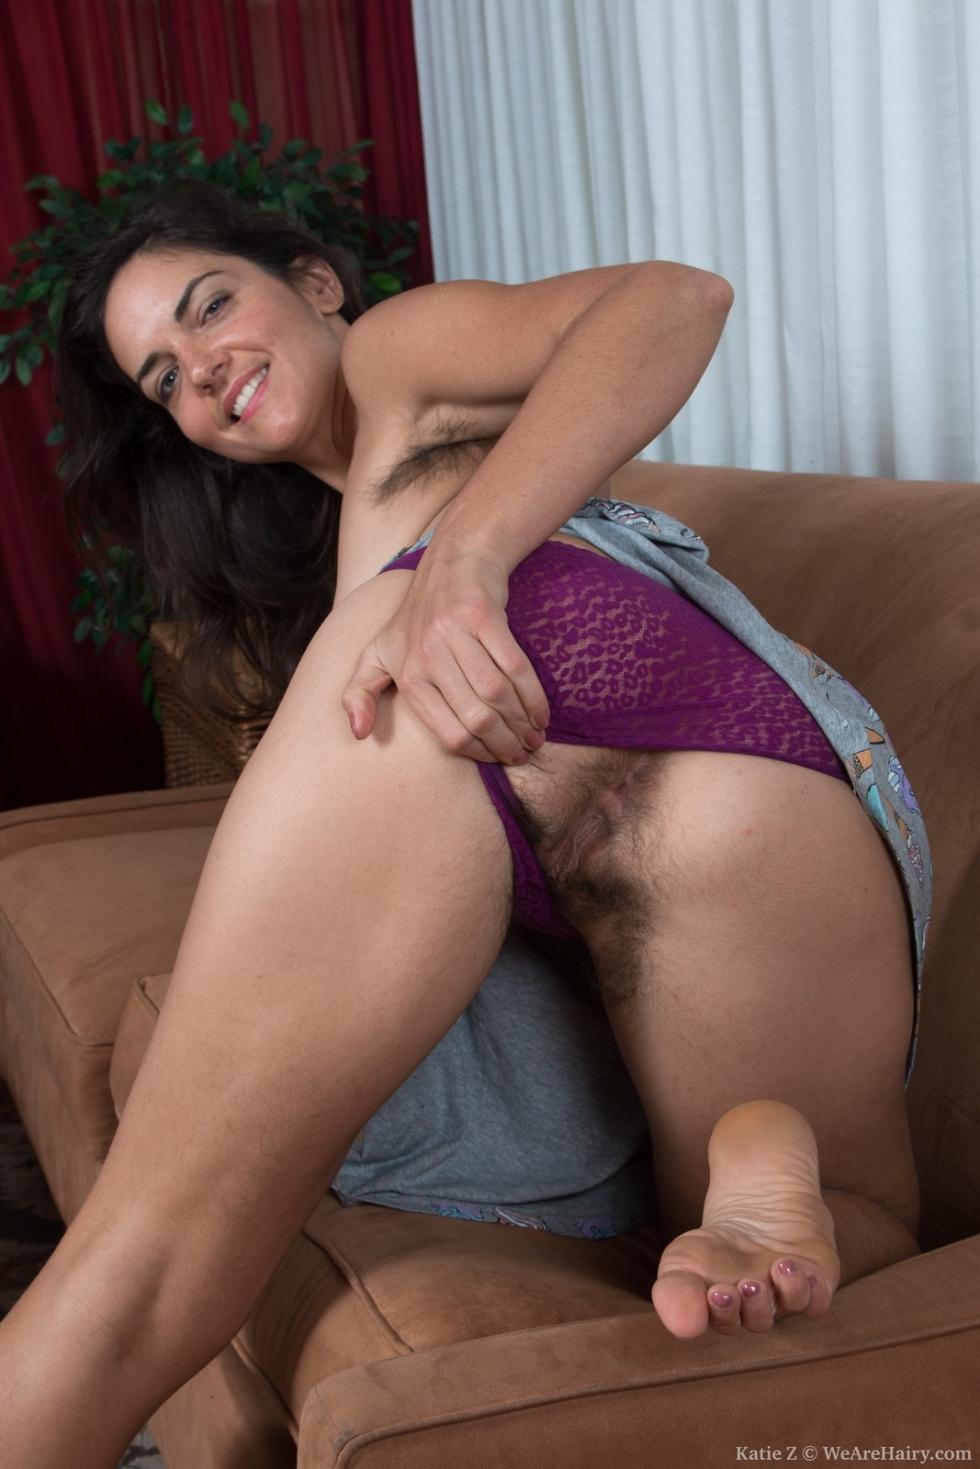 Big boobs panties couch very grateful